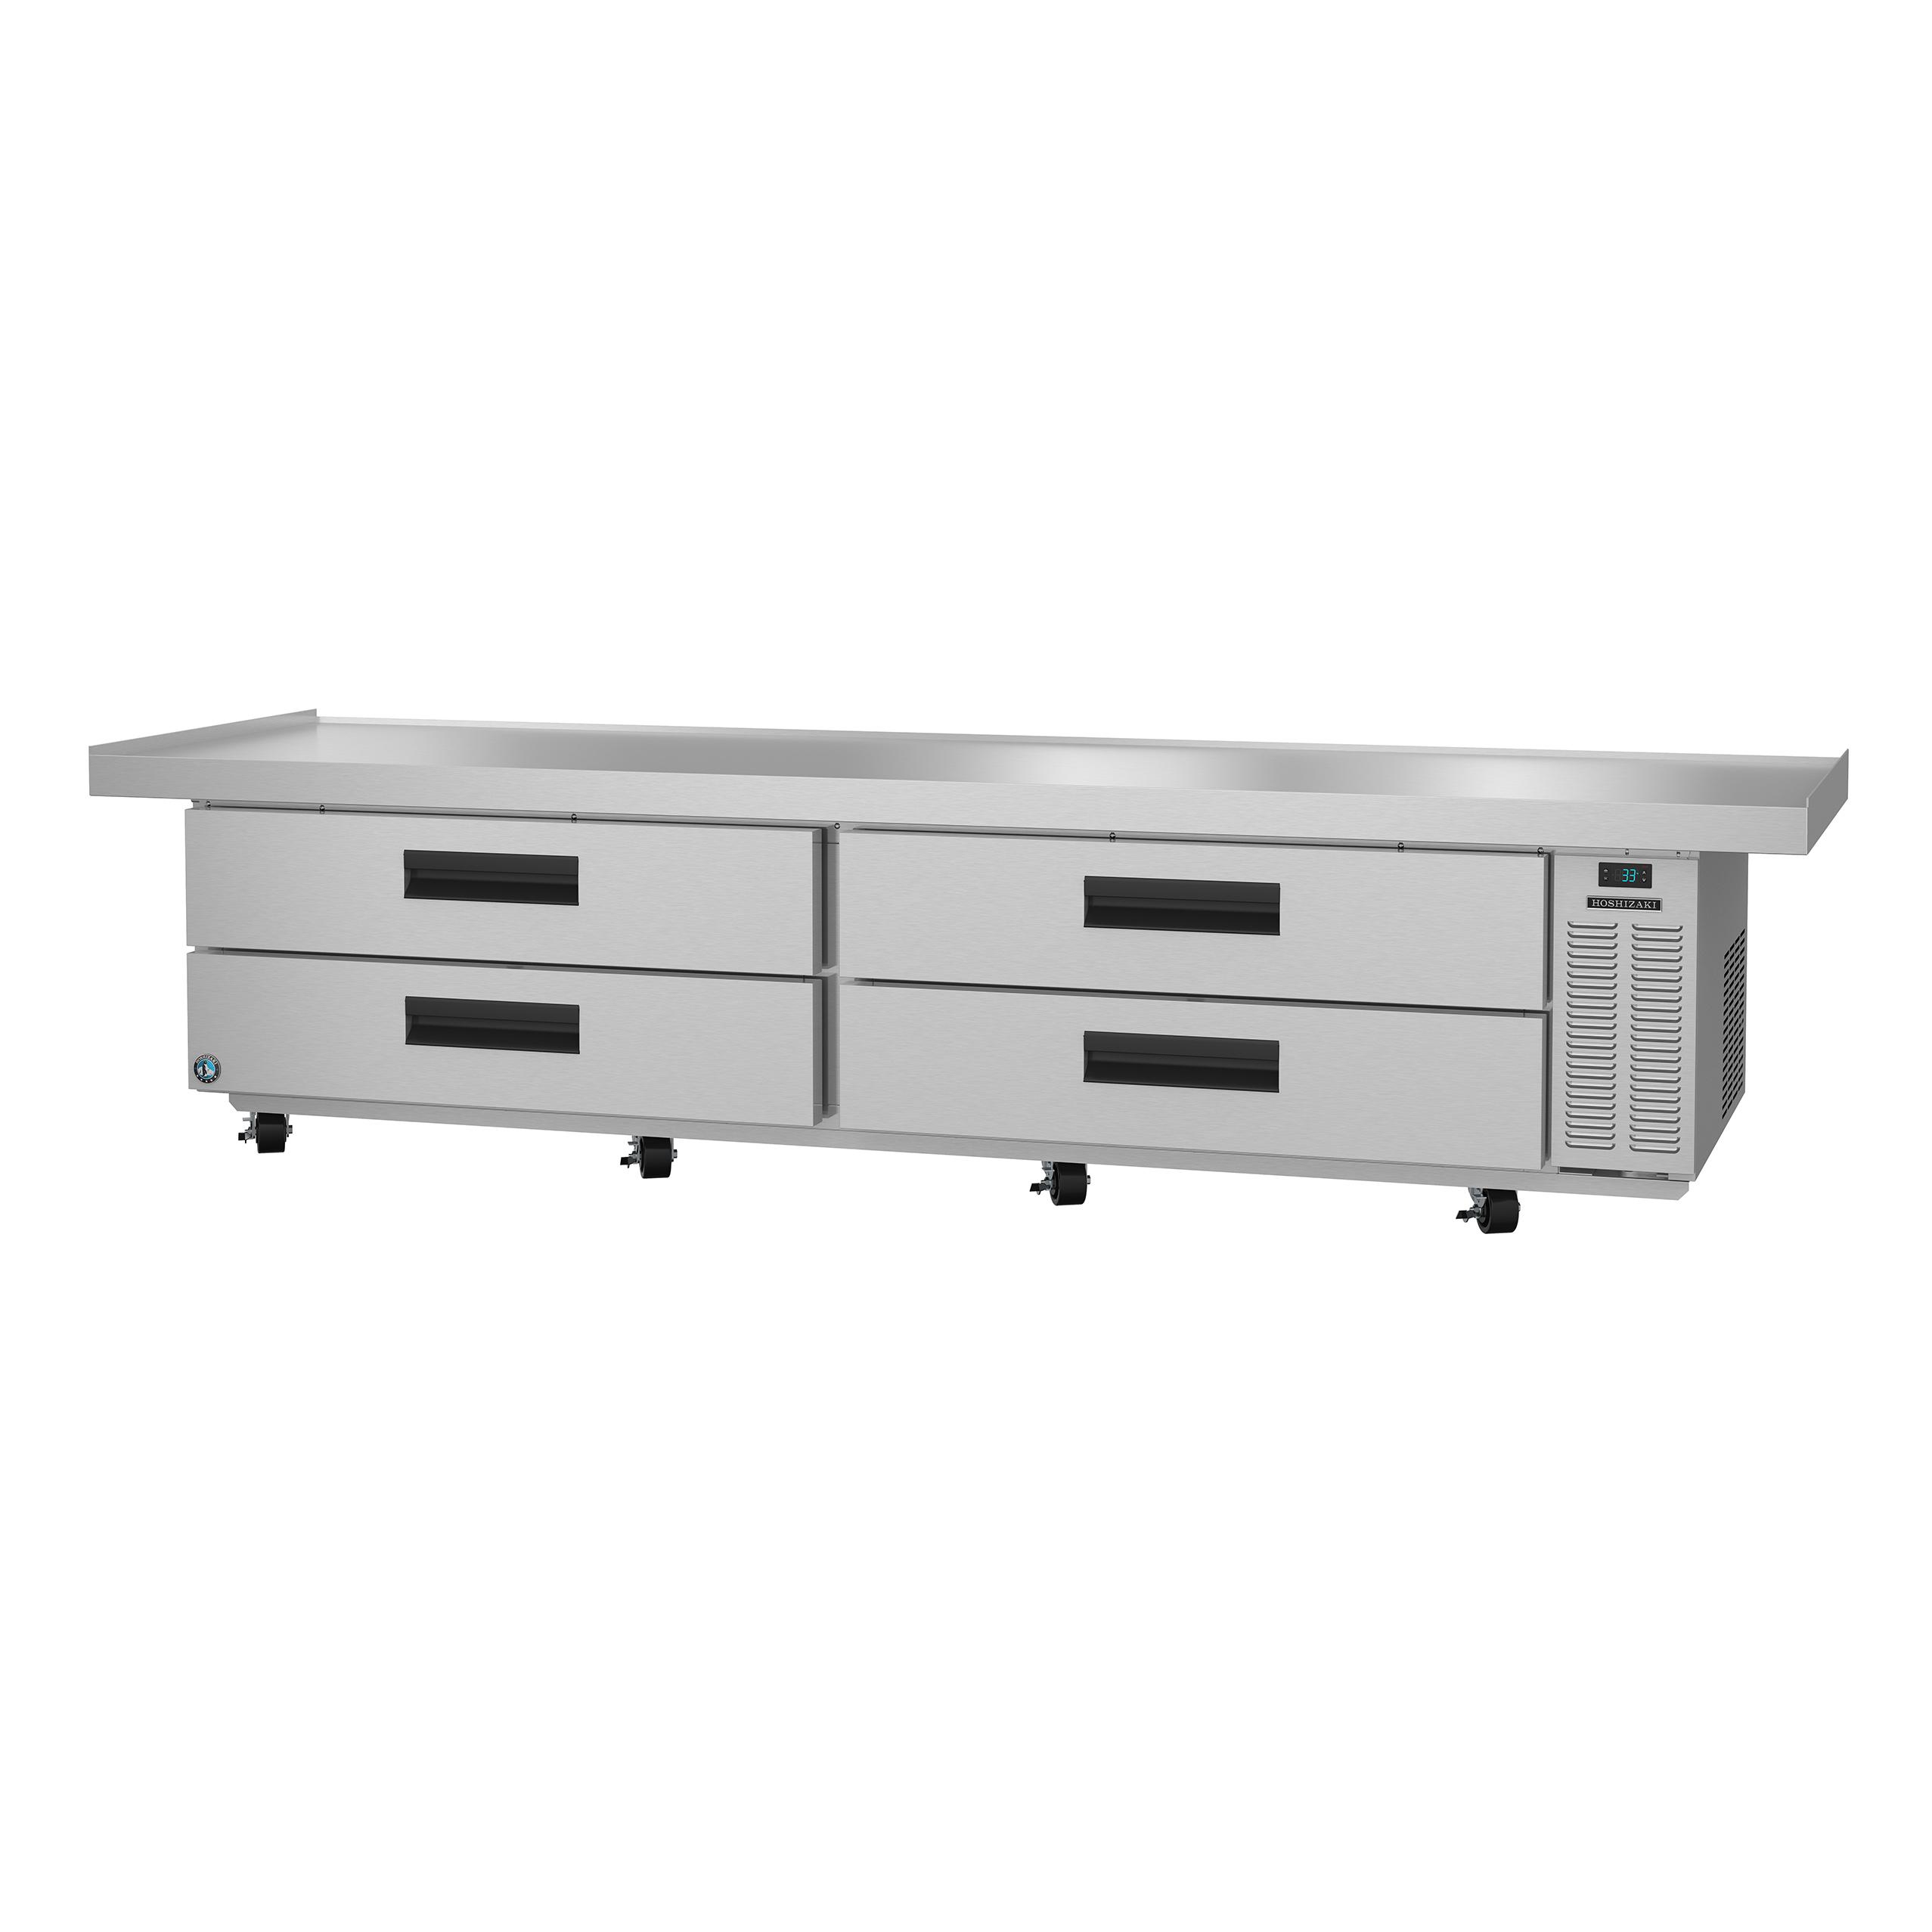 Hoshizaki CR110A equipment stand, refrigerated base